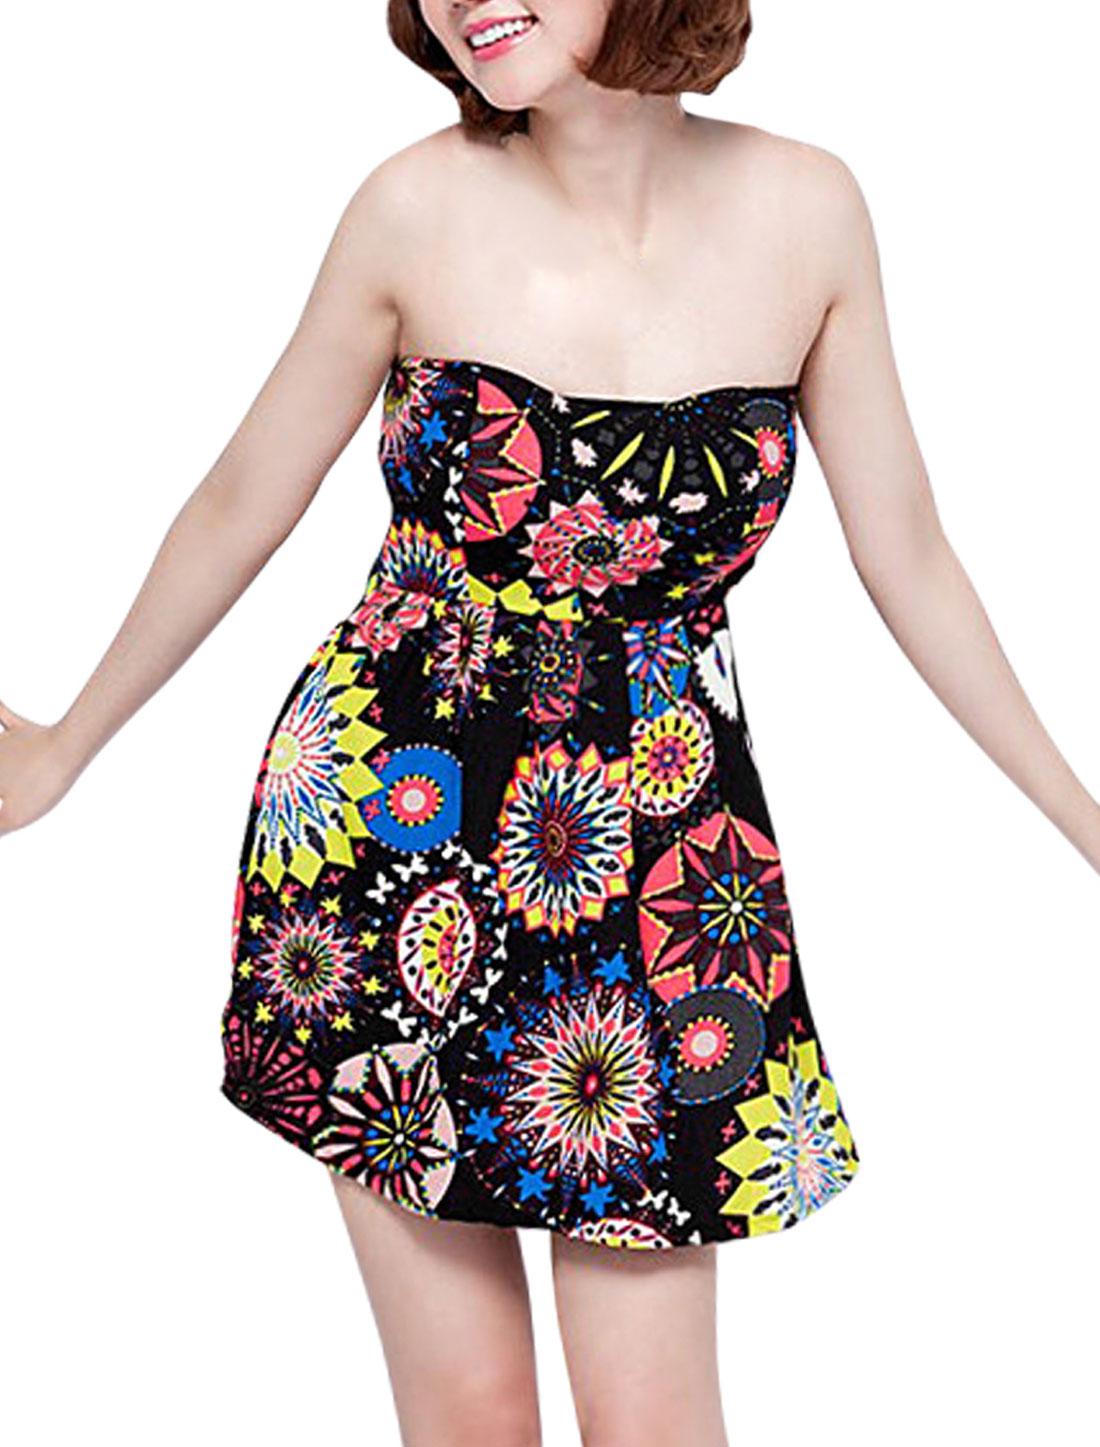 Women Self Tie String Stretch Bust Sunflowers Pattern Dress Black XS